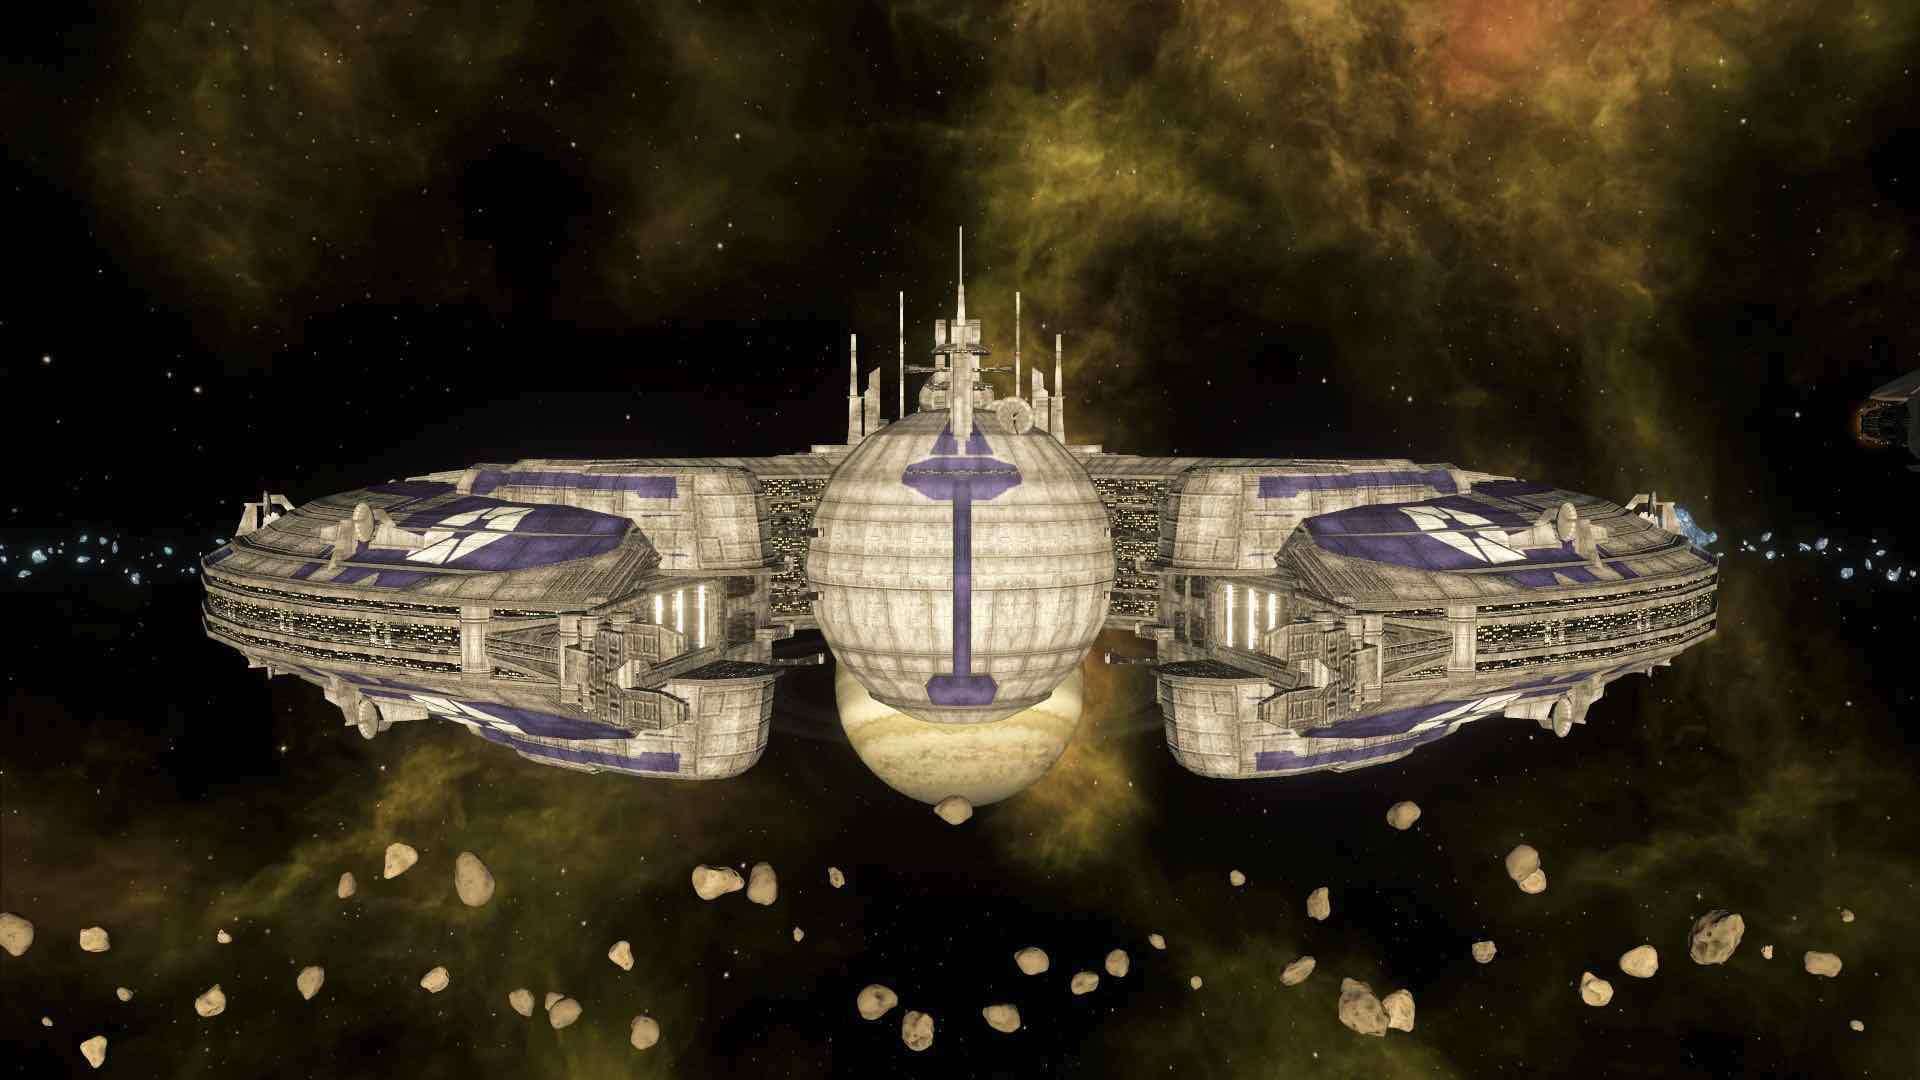 Star Wars Cis Ship Pack 2 2 3 Mod For Stellaris